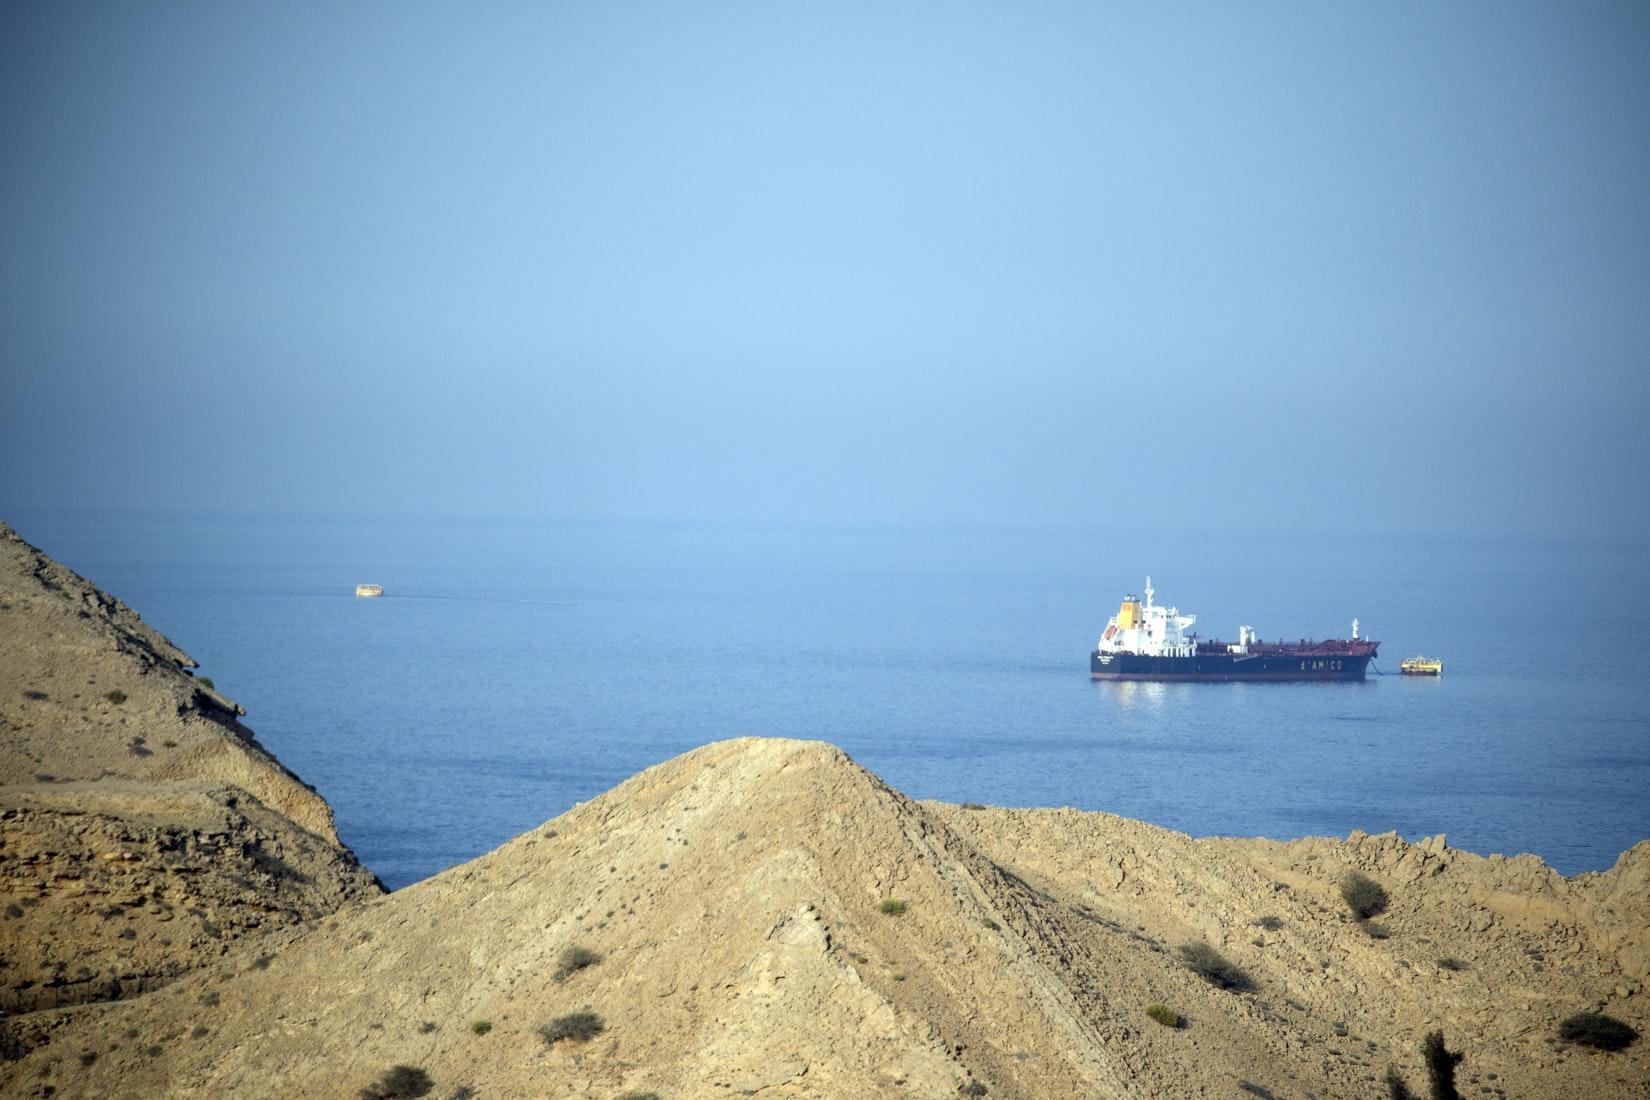 pétrole arabie saoudite